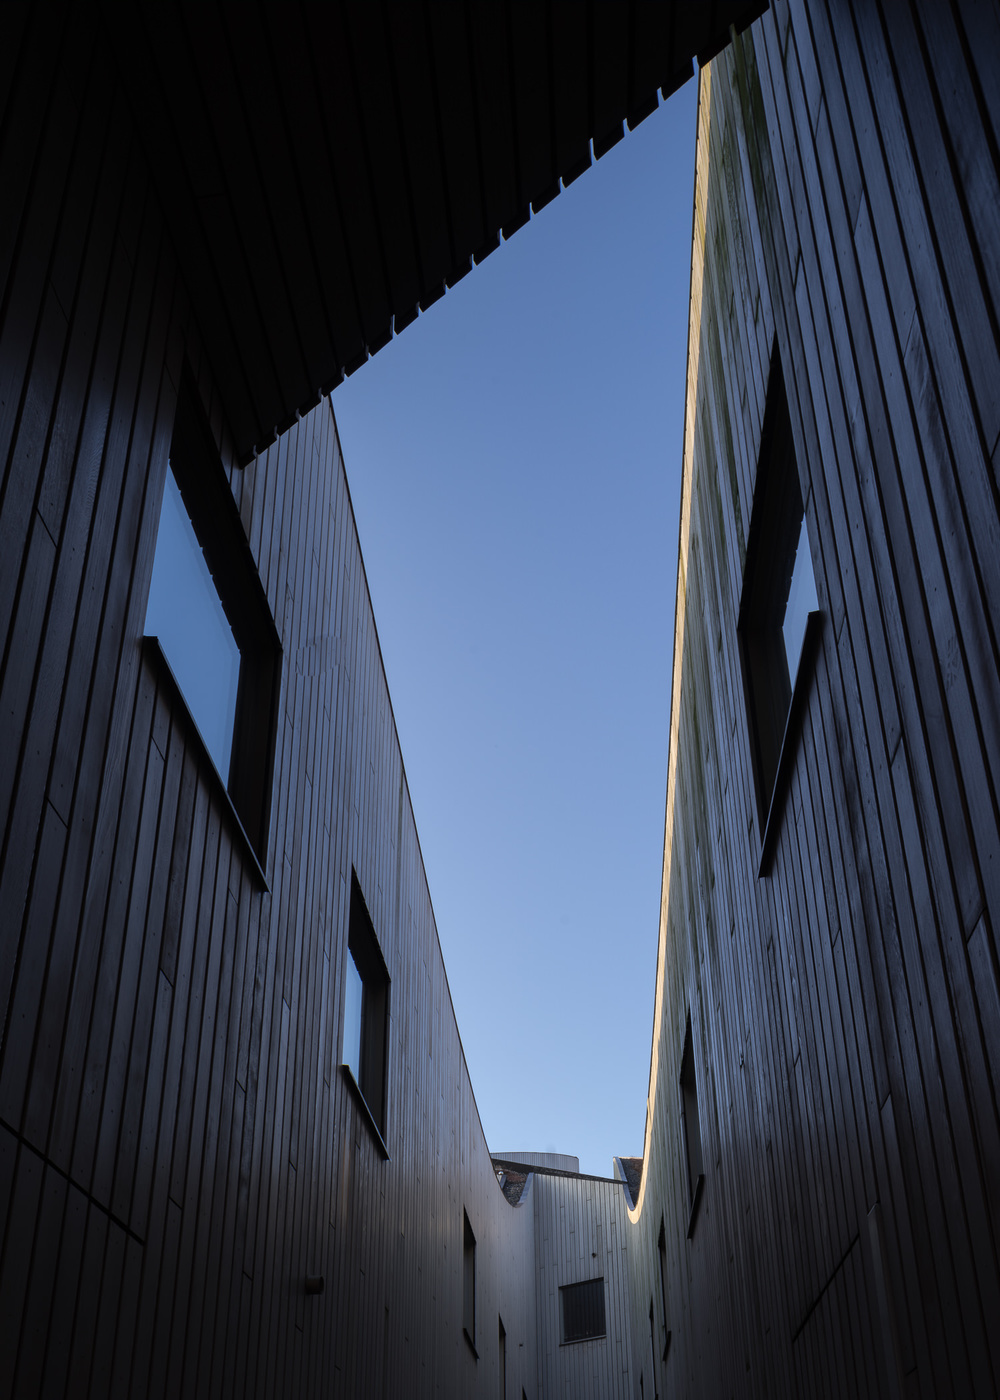 amsterdam-modern-architecture-facade-het-funen-mark-hadden-photography-architectuurfotograaf-003.jpg